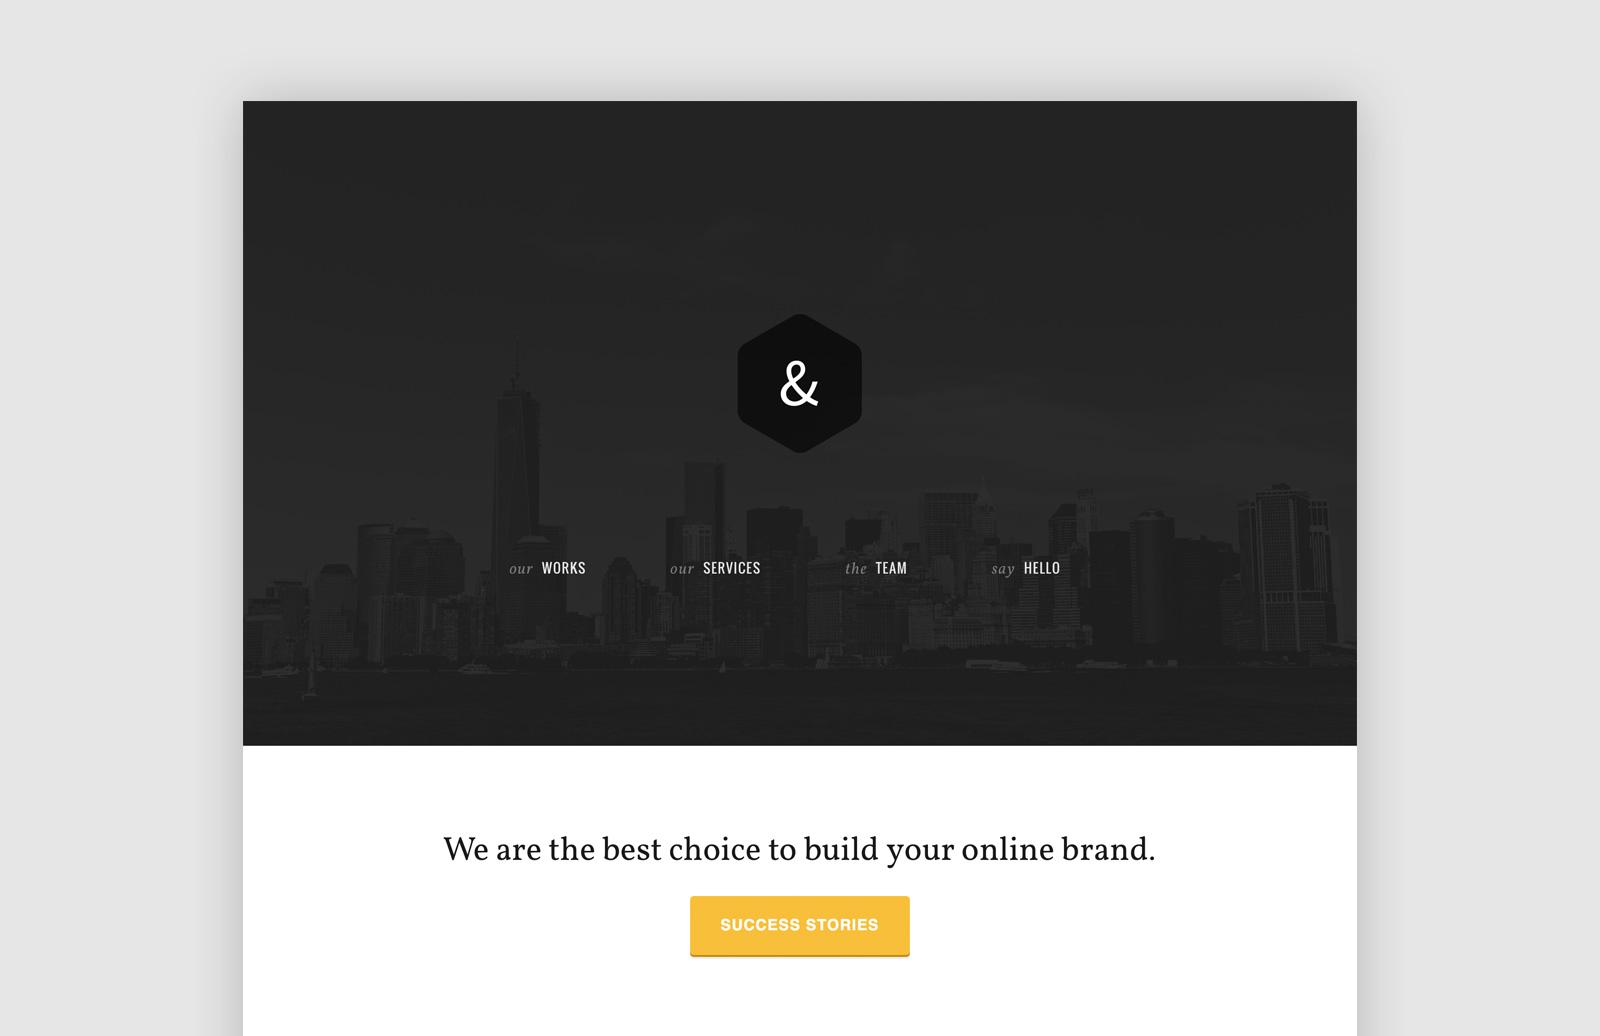 AmpPortfolio - Responsive HTML5/CSS3 theme for agencies